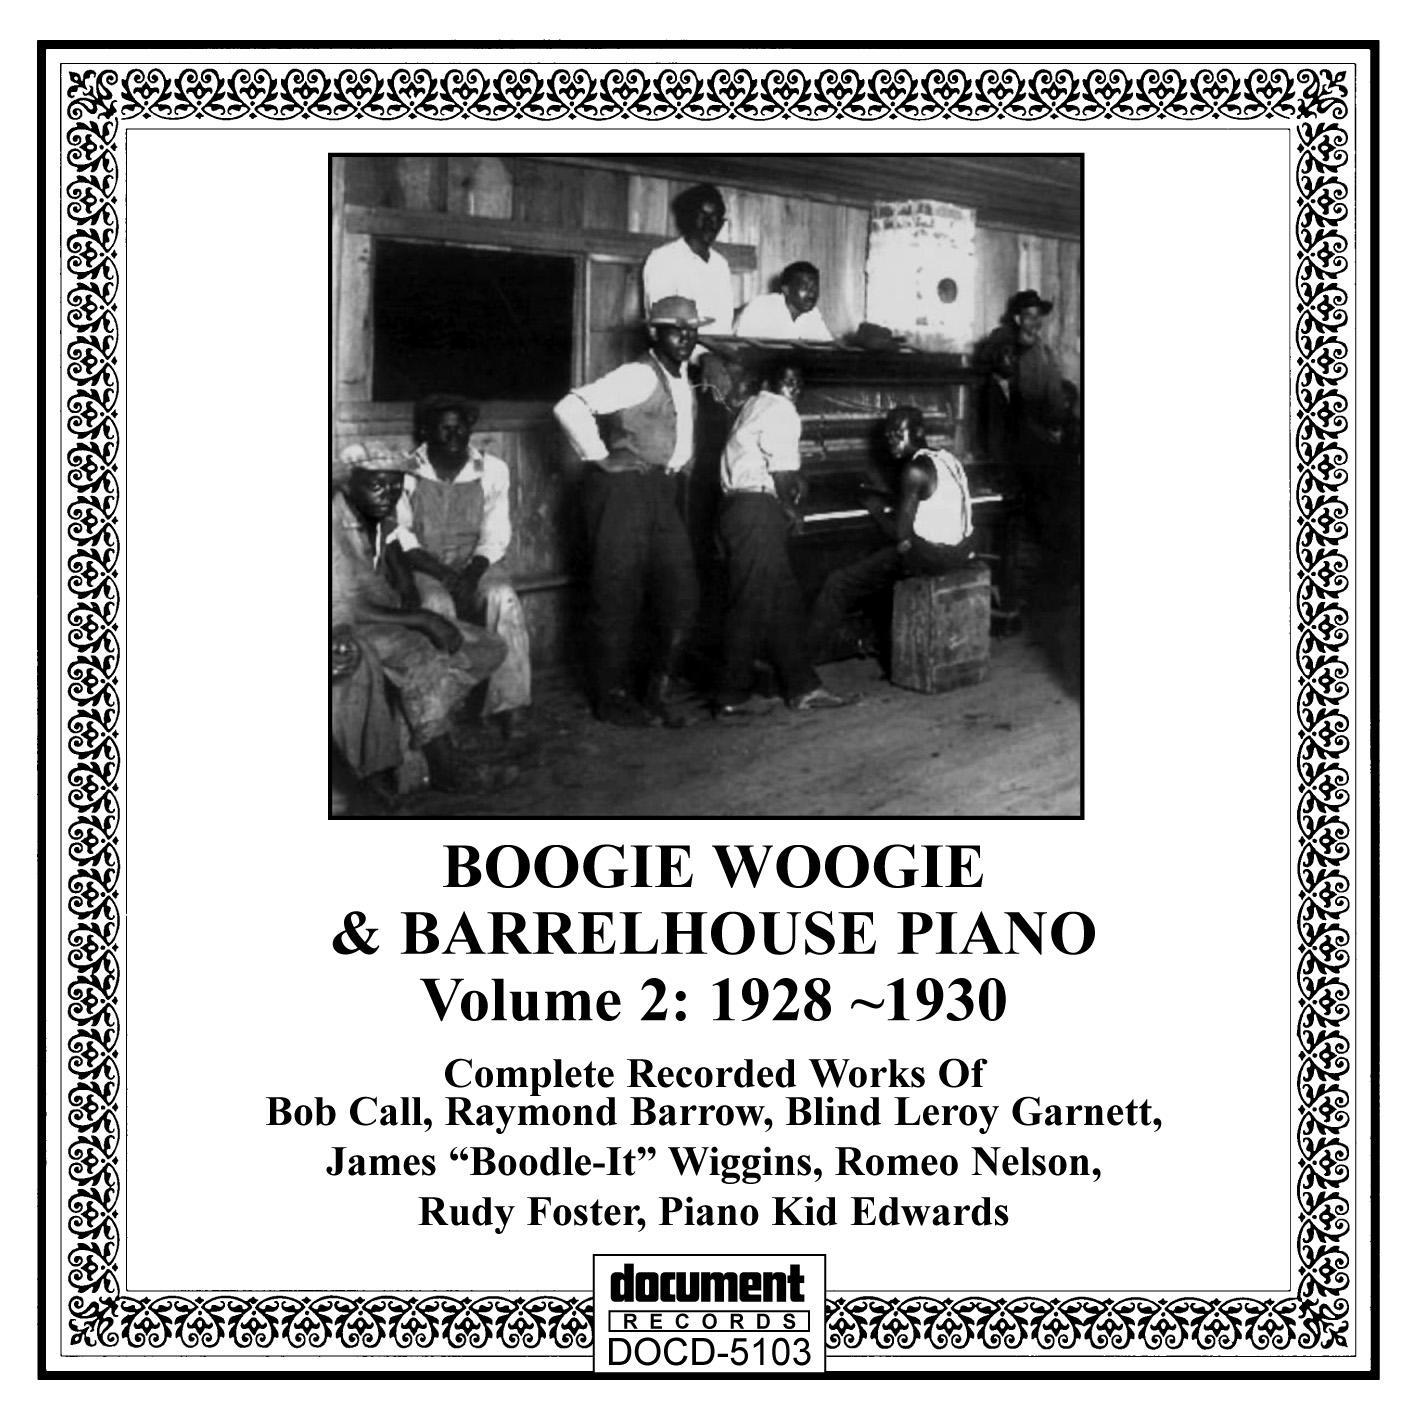 Boogie Woogie & Barrelhouse Piano Vol  2 (1928-1930) - The